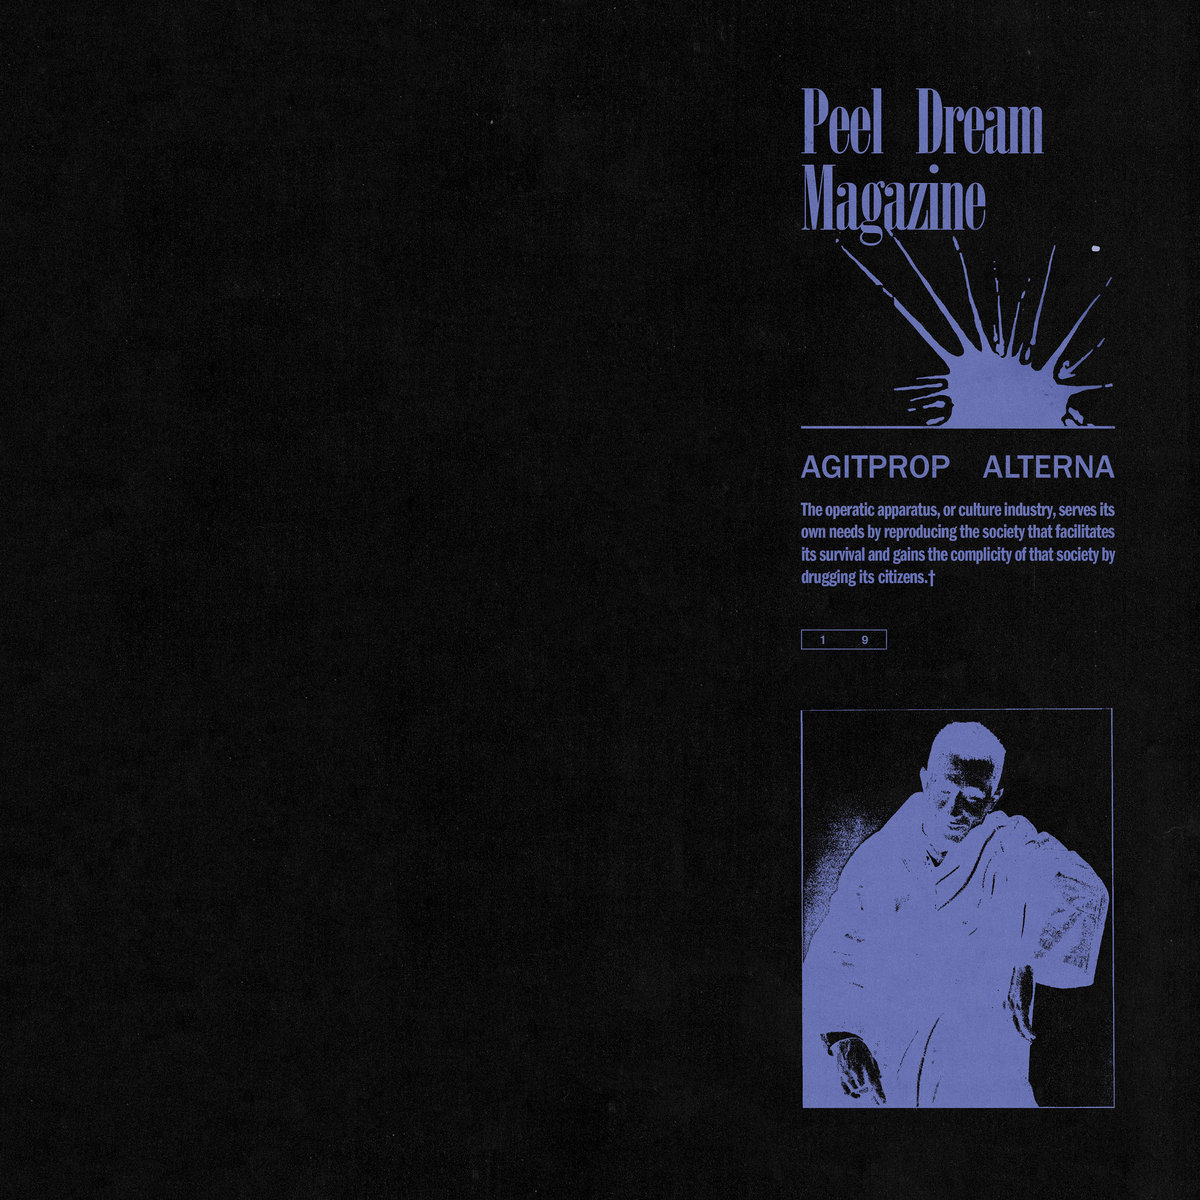 Peel Dream Magazine - Agitprop Alterna [LP]